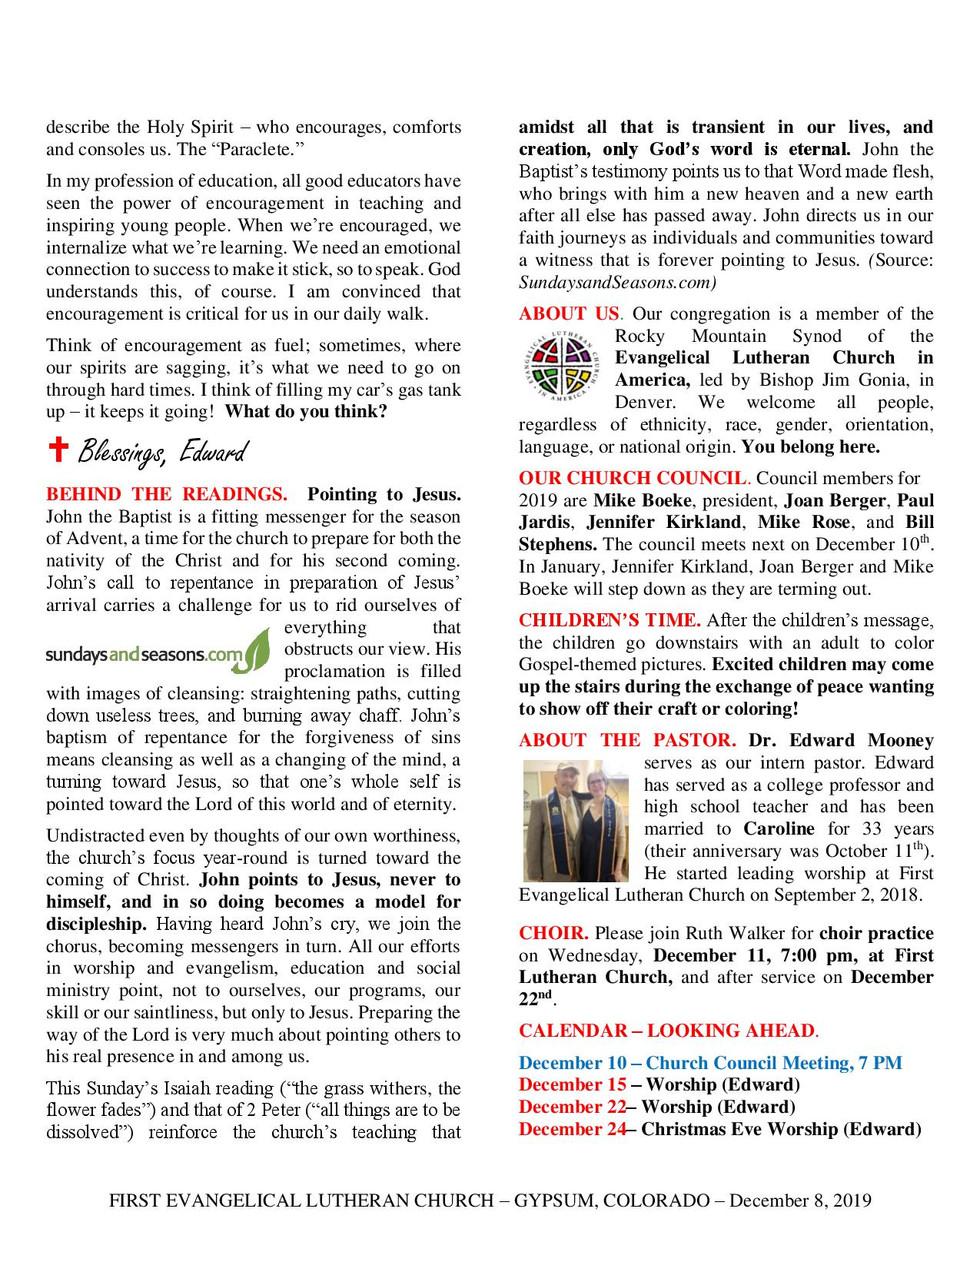 Newsletter December 8, 2019, page 2